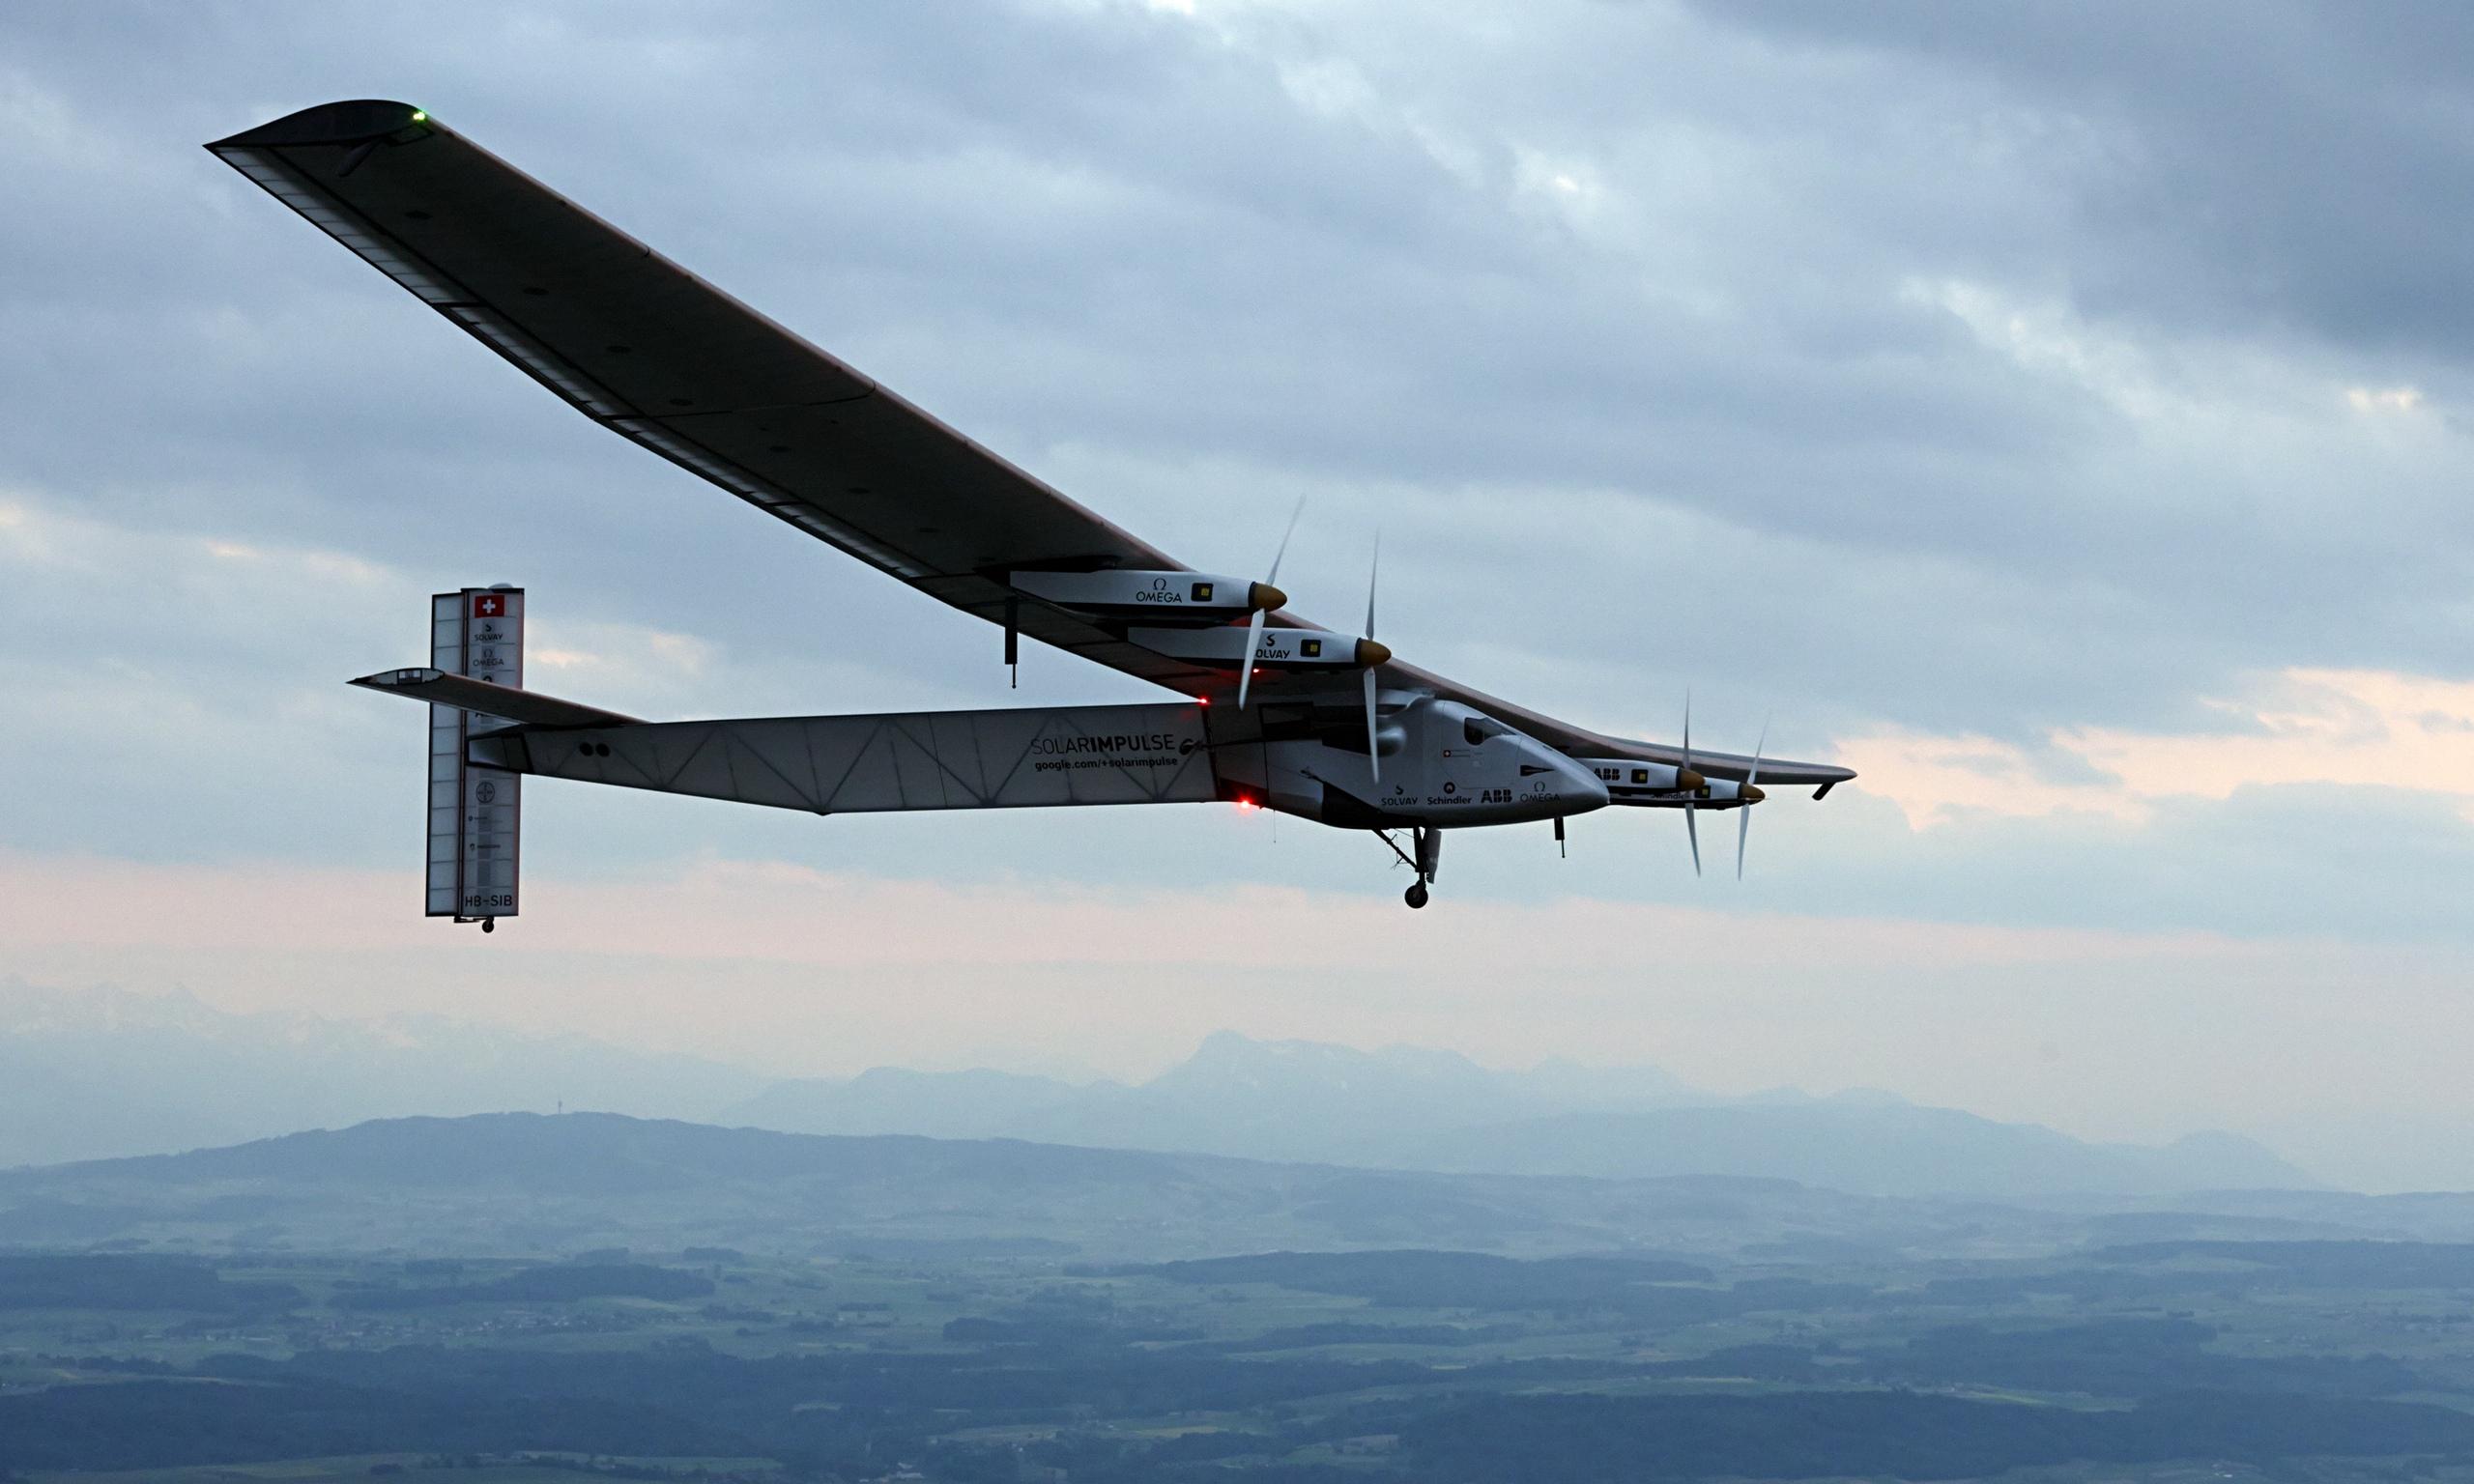 Solar Energy Plane Solar-powered-plane-014.jpg